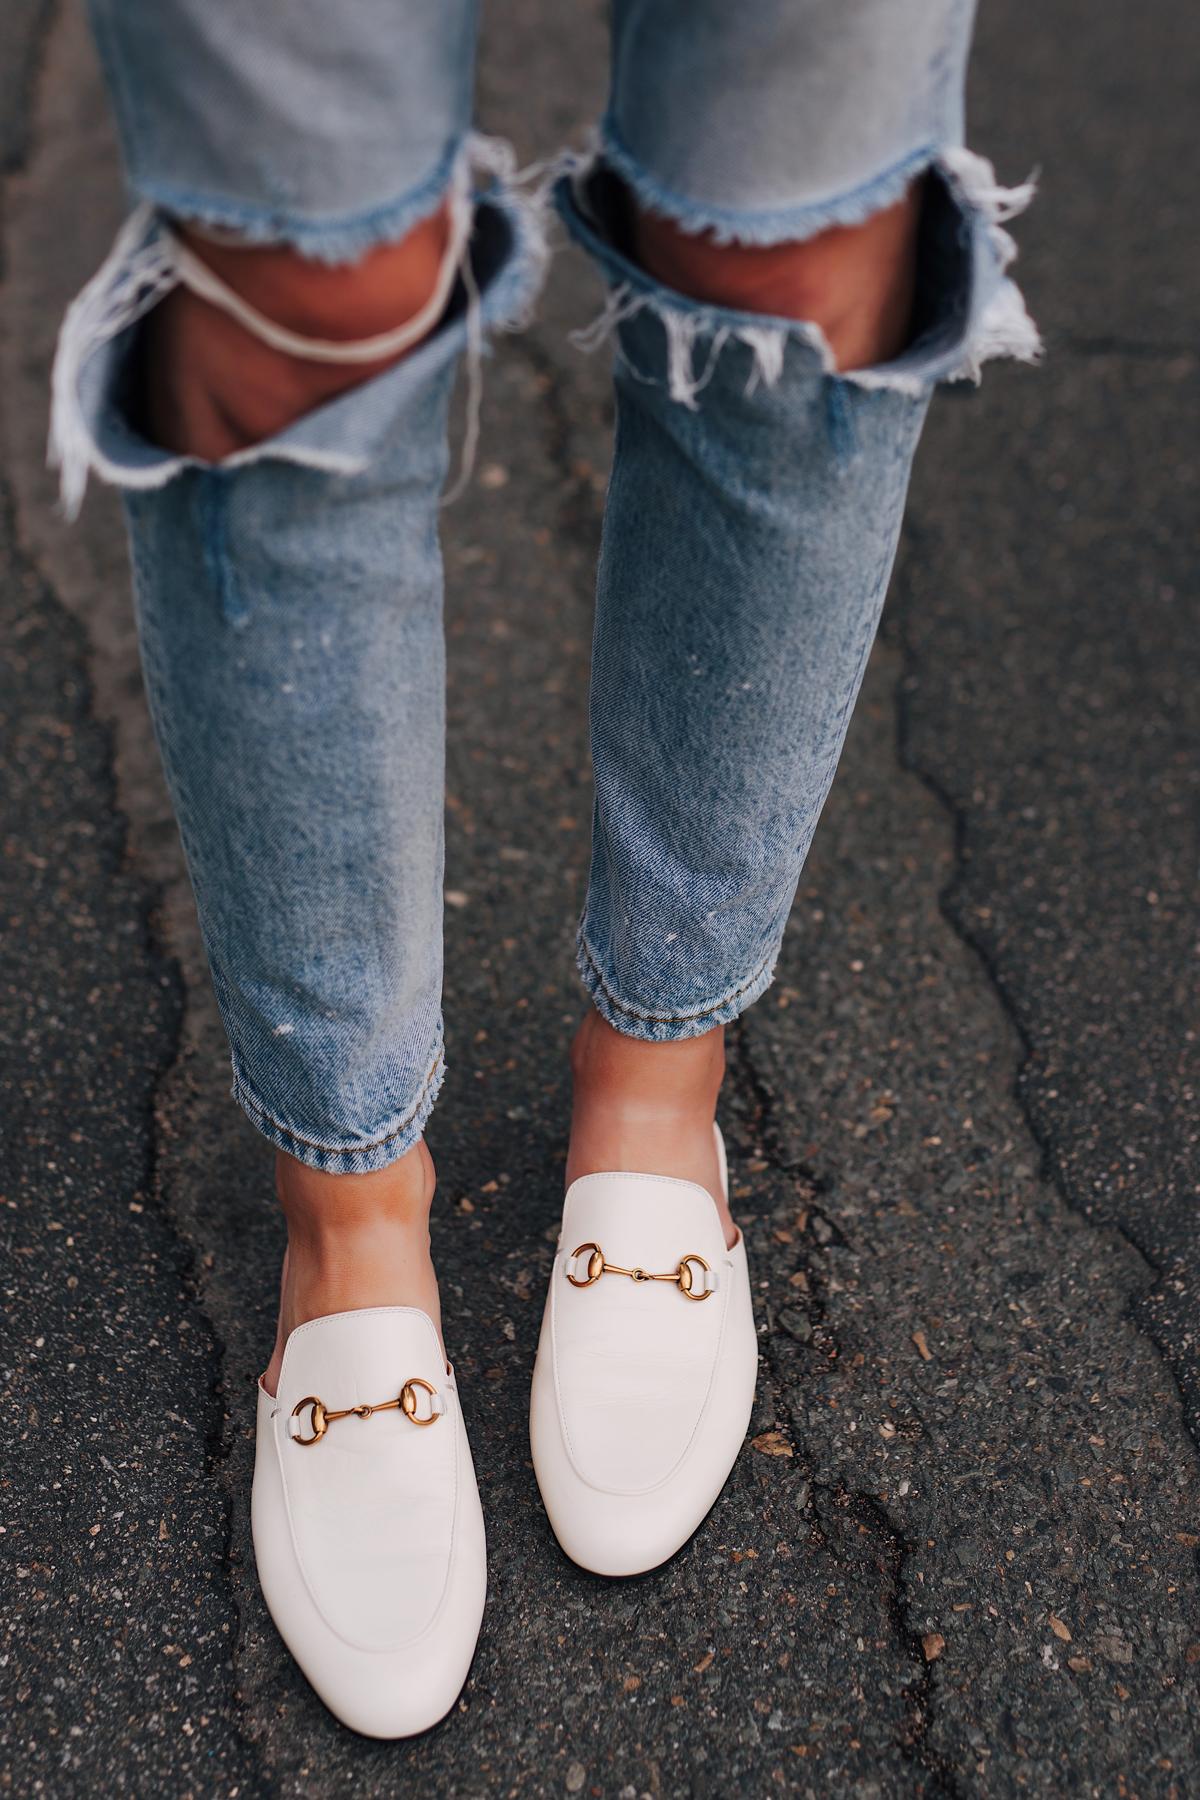 Woman Wearing Boyish Ripped Jeans Gucci Princetown White Mules Fashion Jackson San Diego Fashion Blogger Street Style